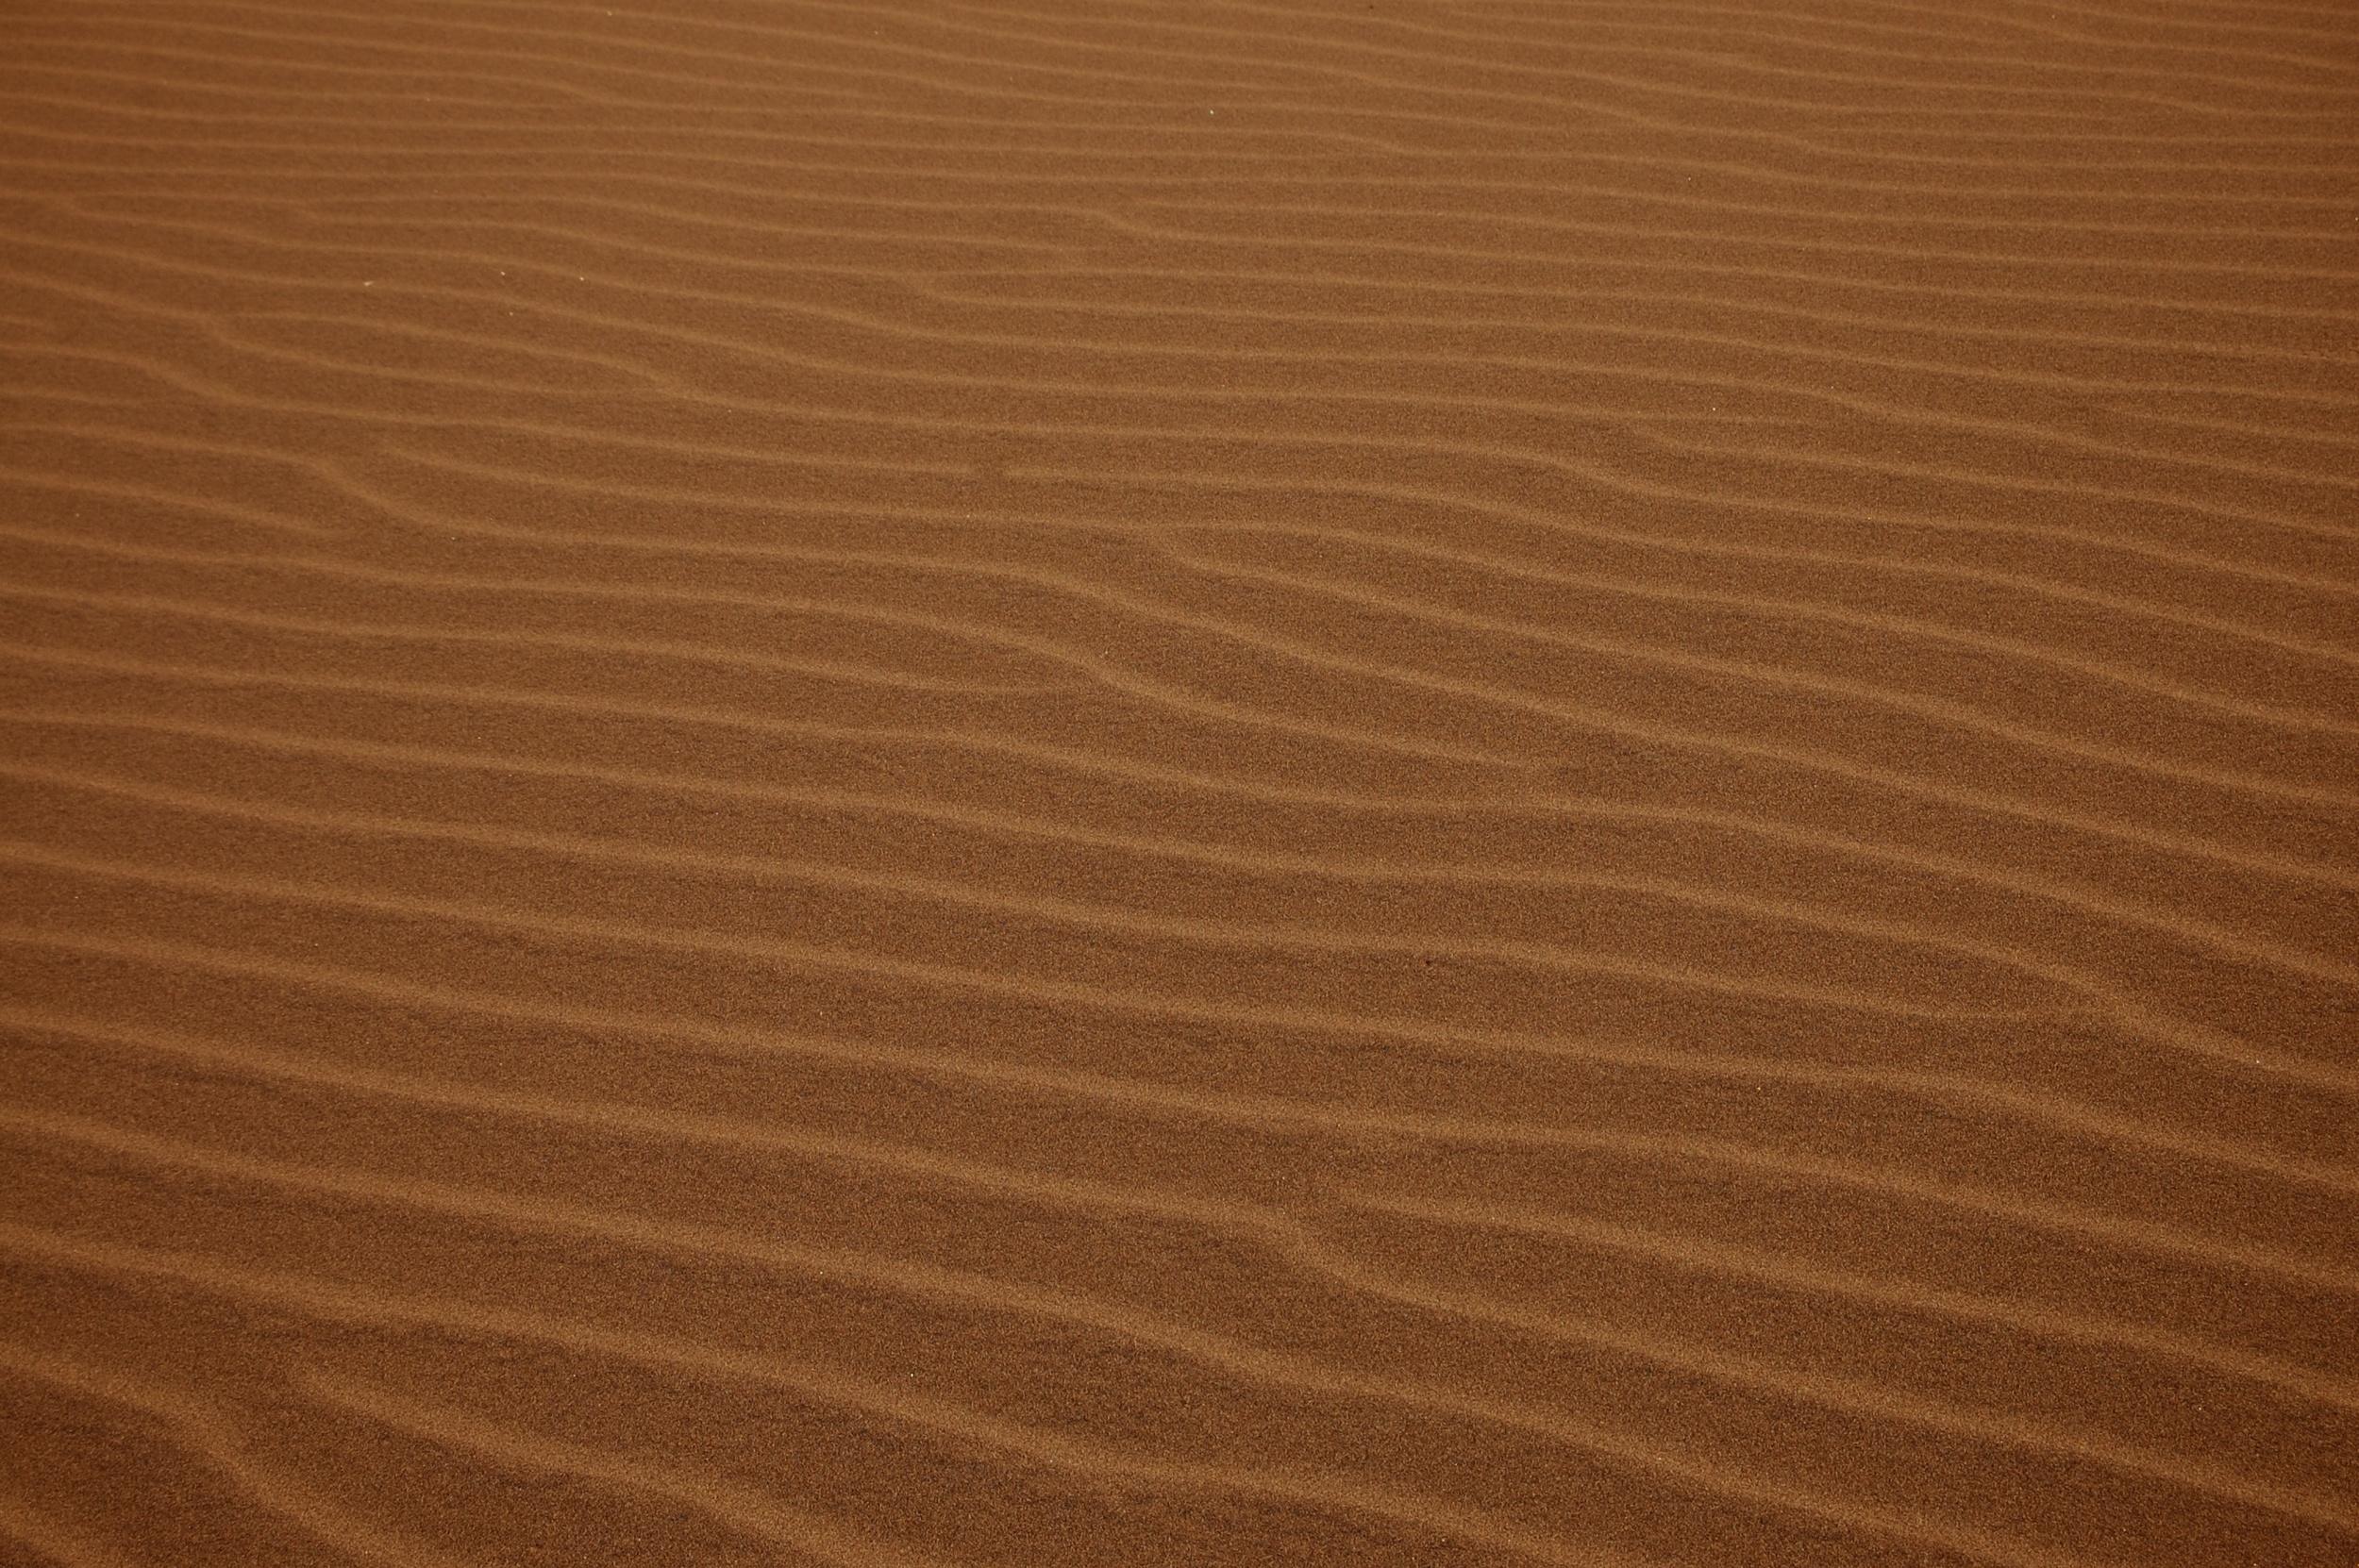 Dunes - Version 2.jpg